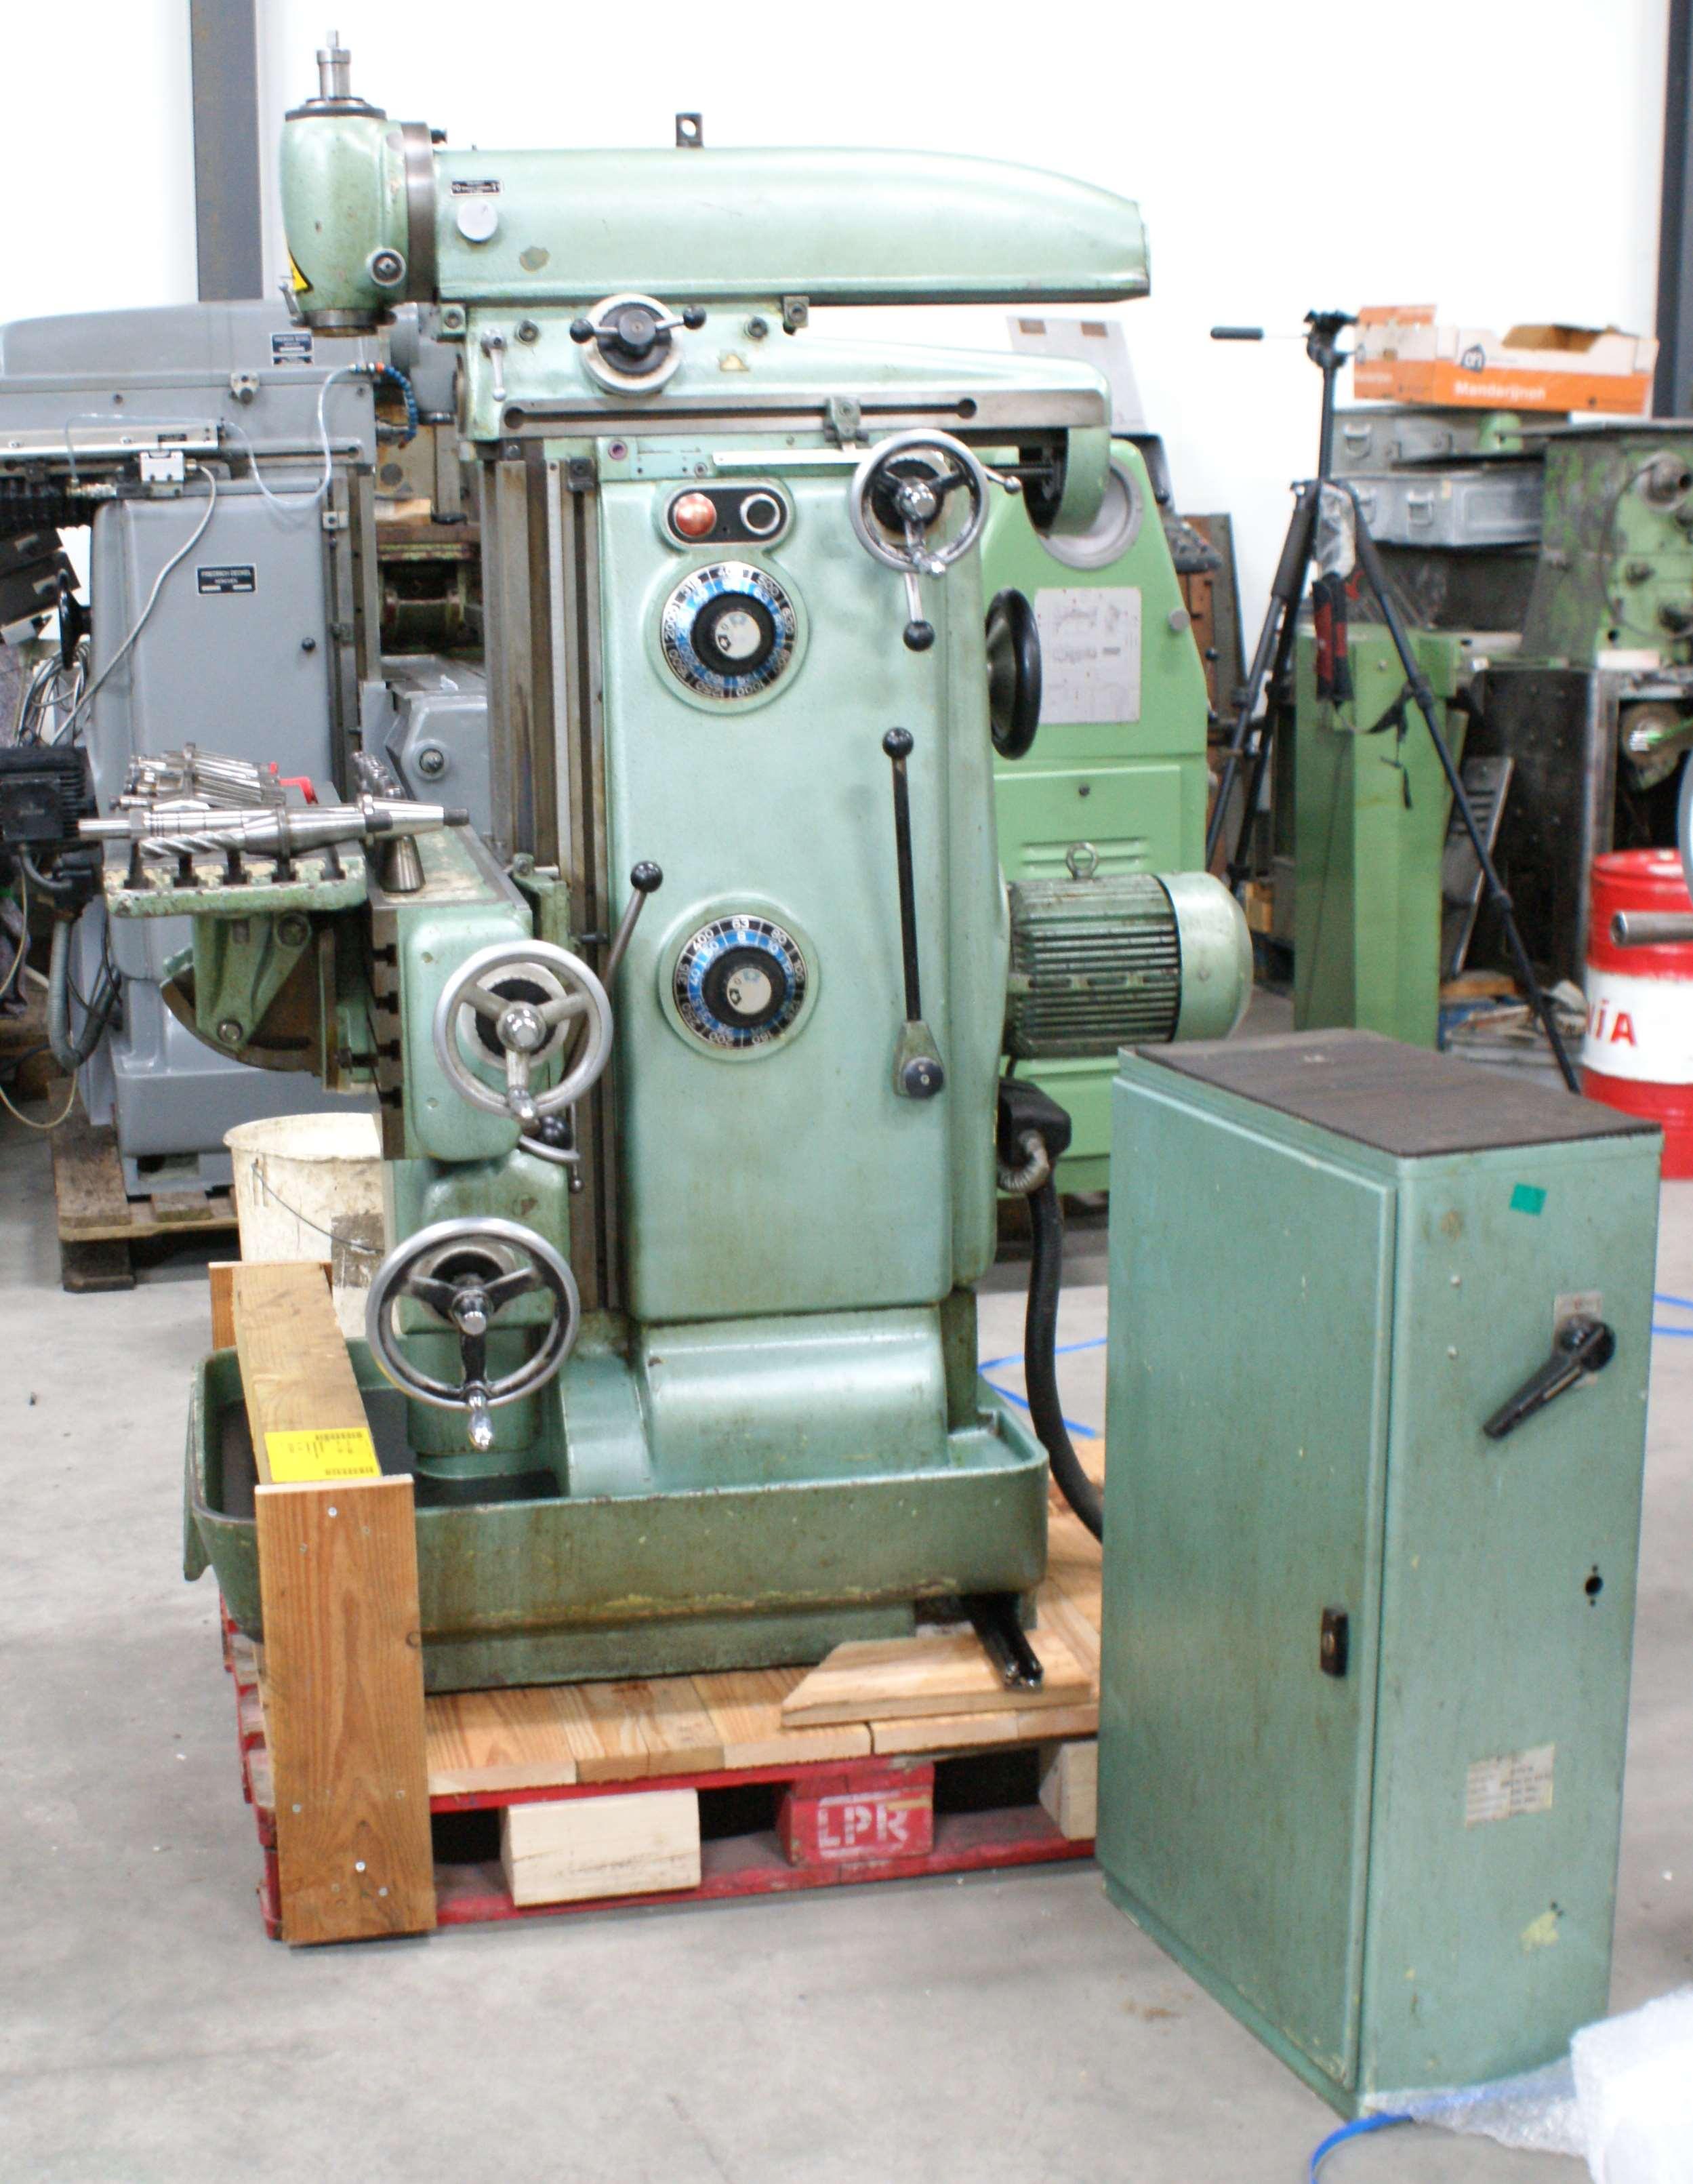 Deckel FP2 Fräsmaschine Universal Gebrauchte Maschinen